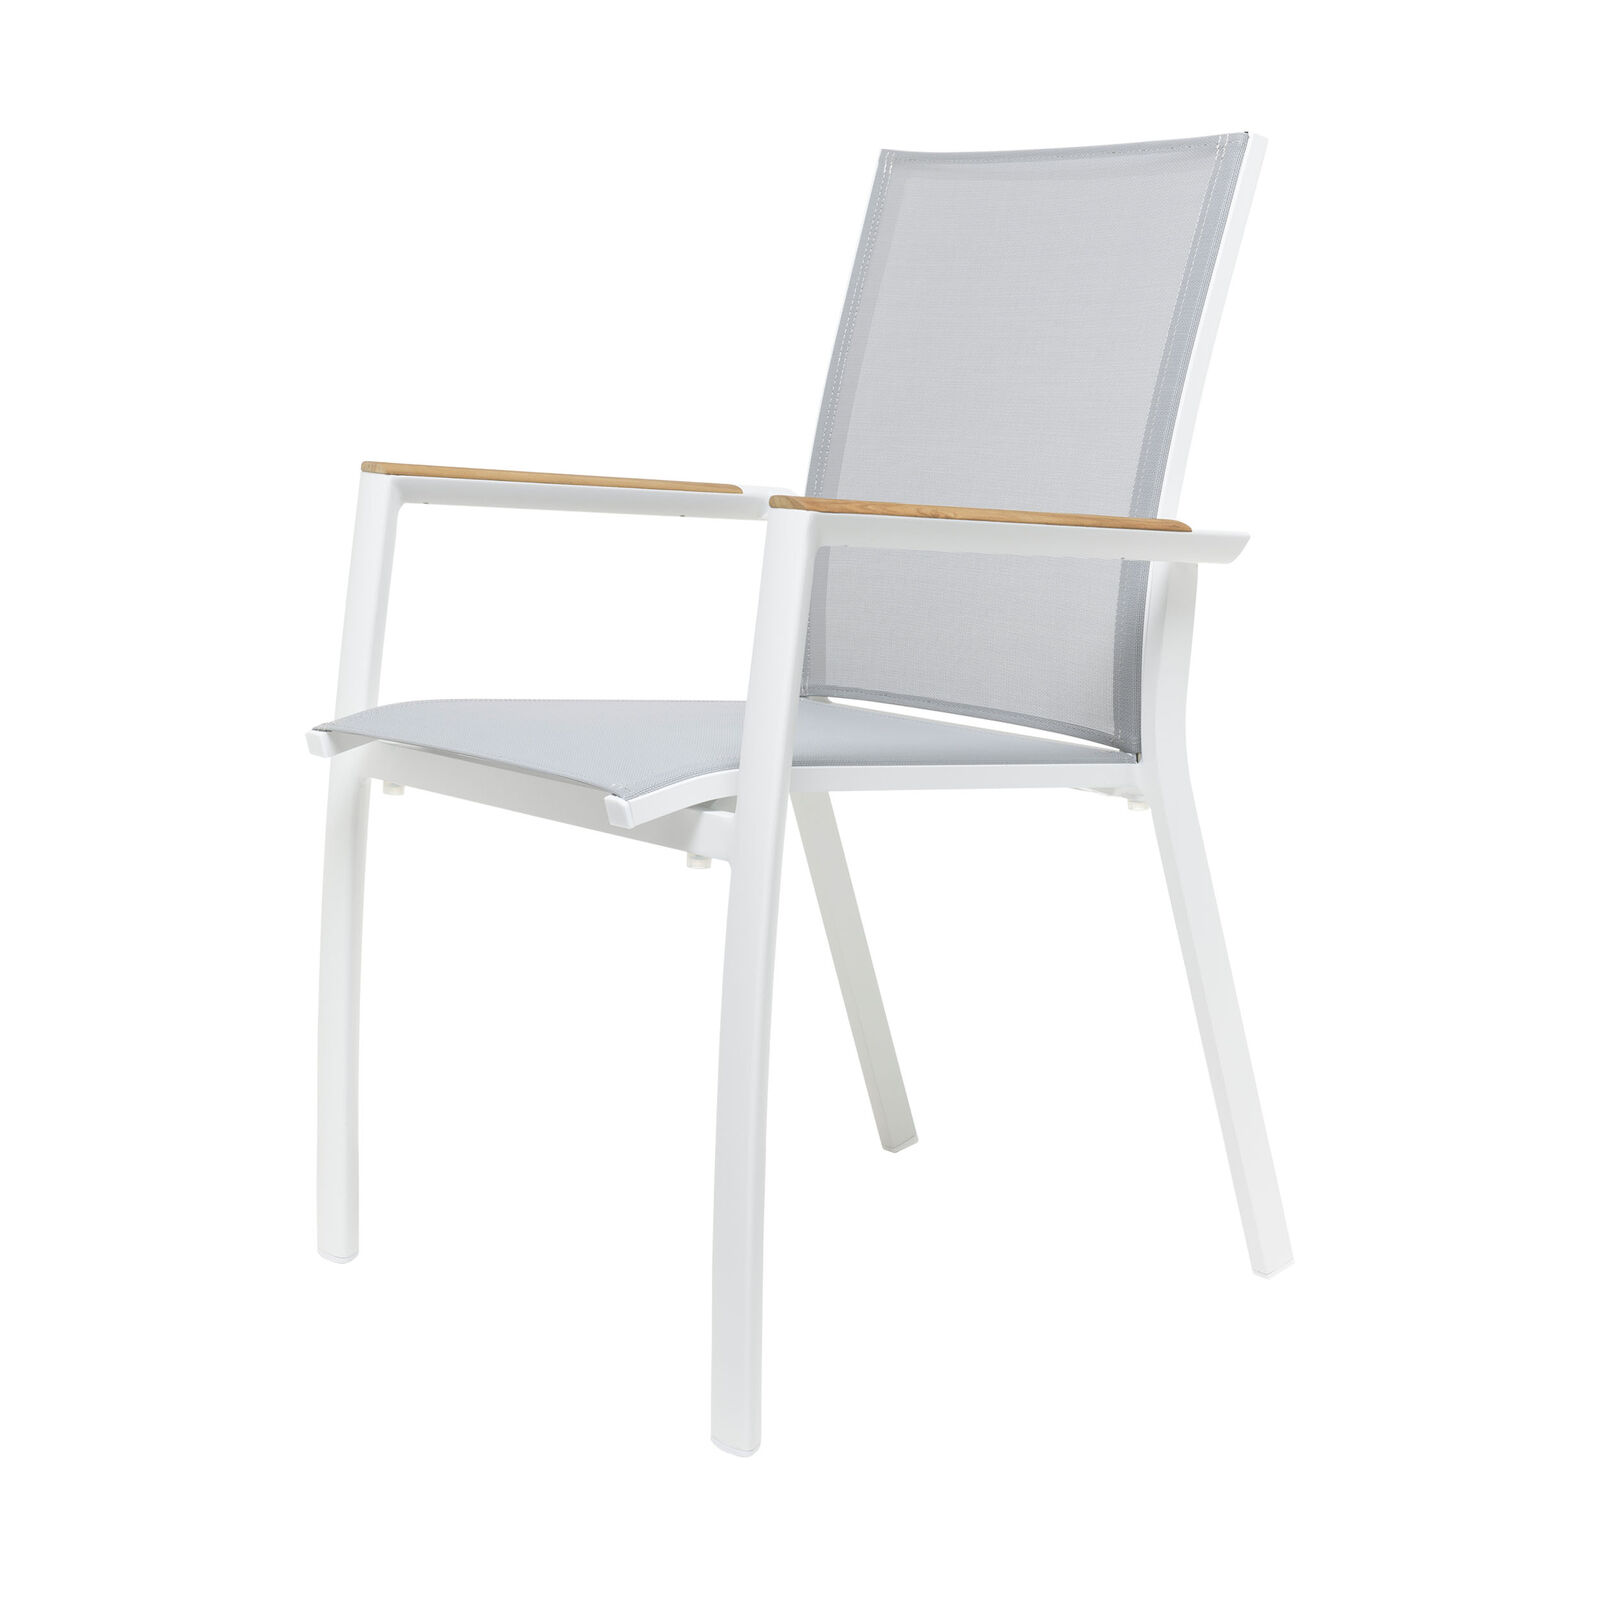 Cadiz Stapelsessel weiß-hellgrau weiß hellgrau 62 x x x 57 cm h 89 cm 0d93c5